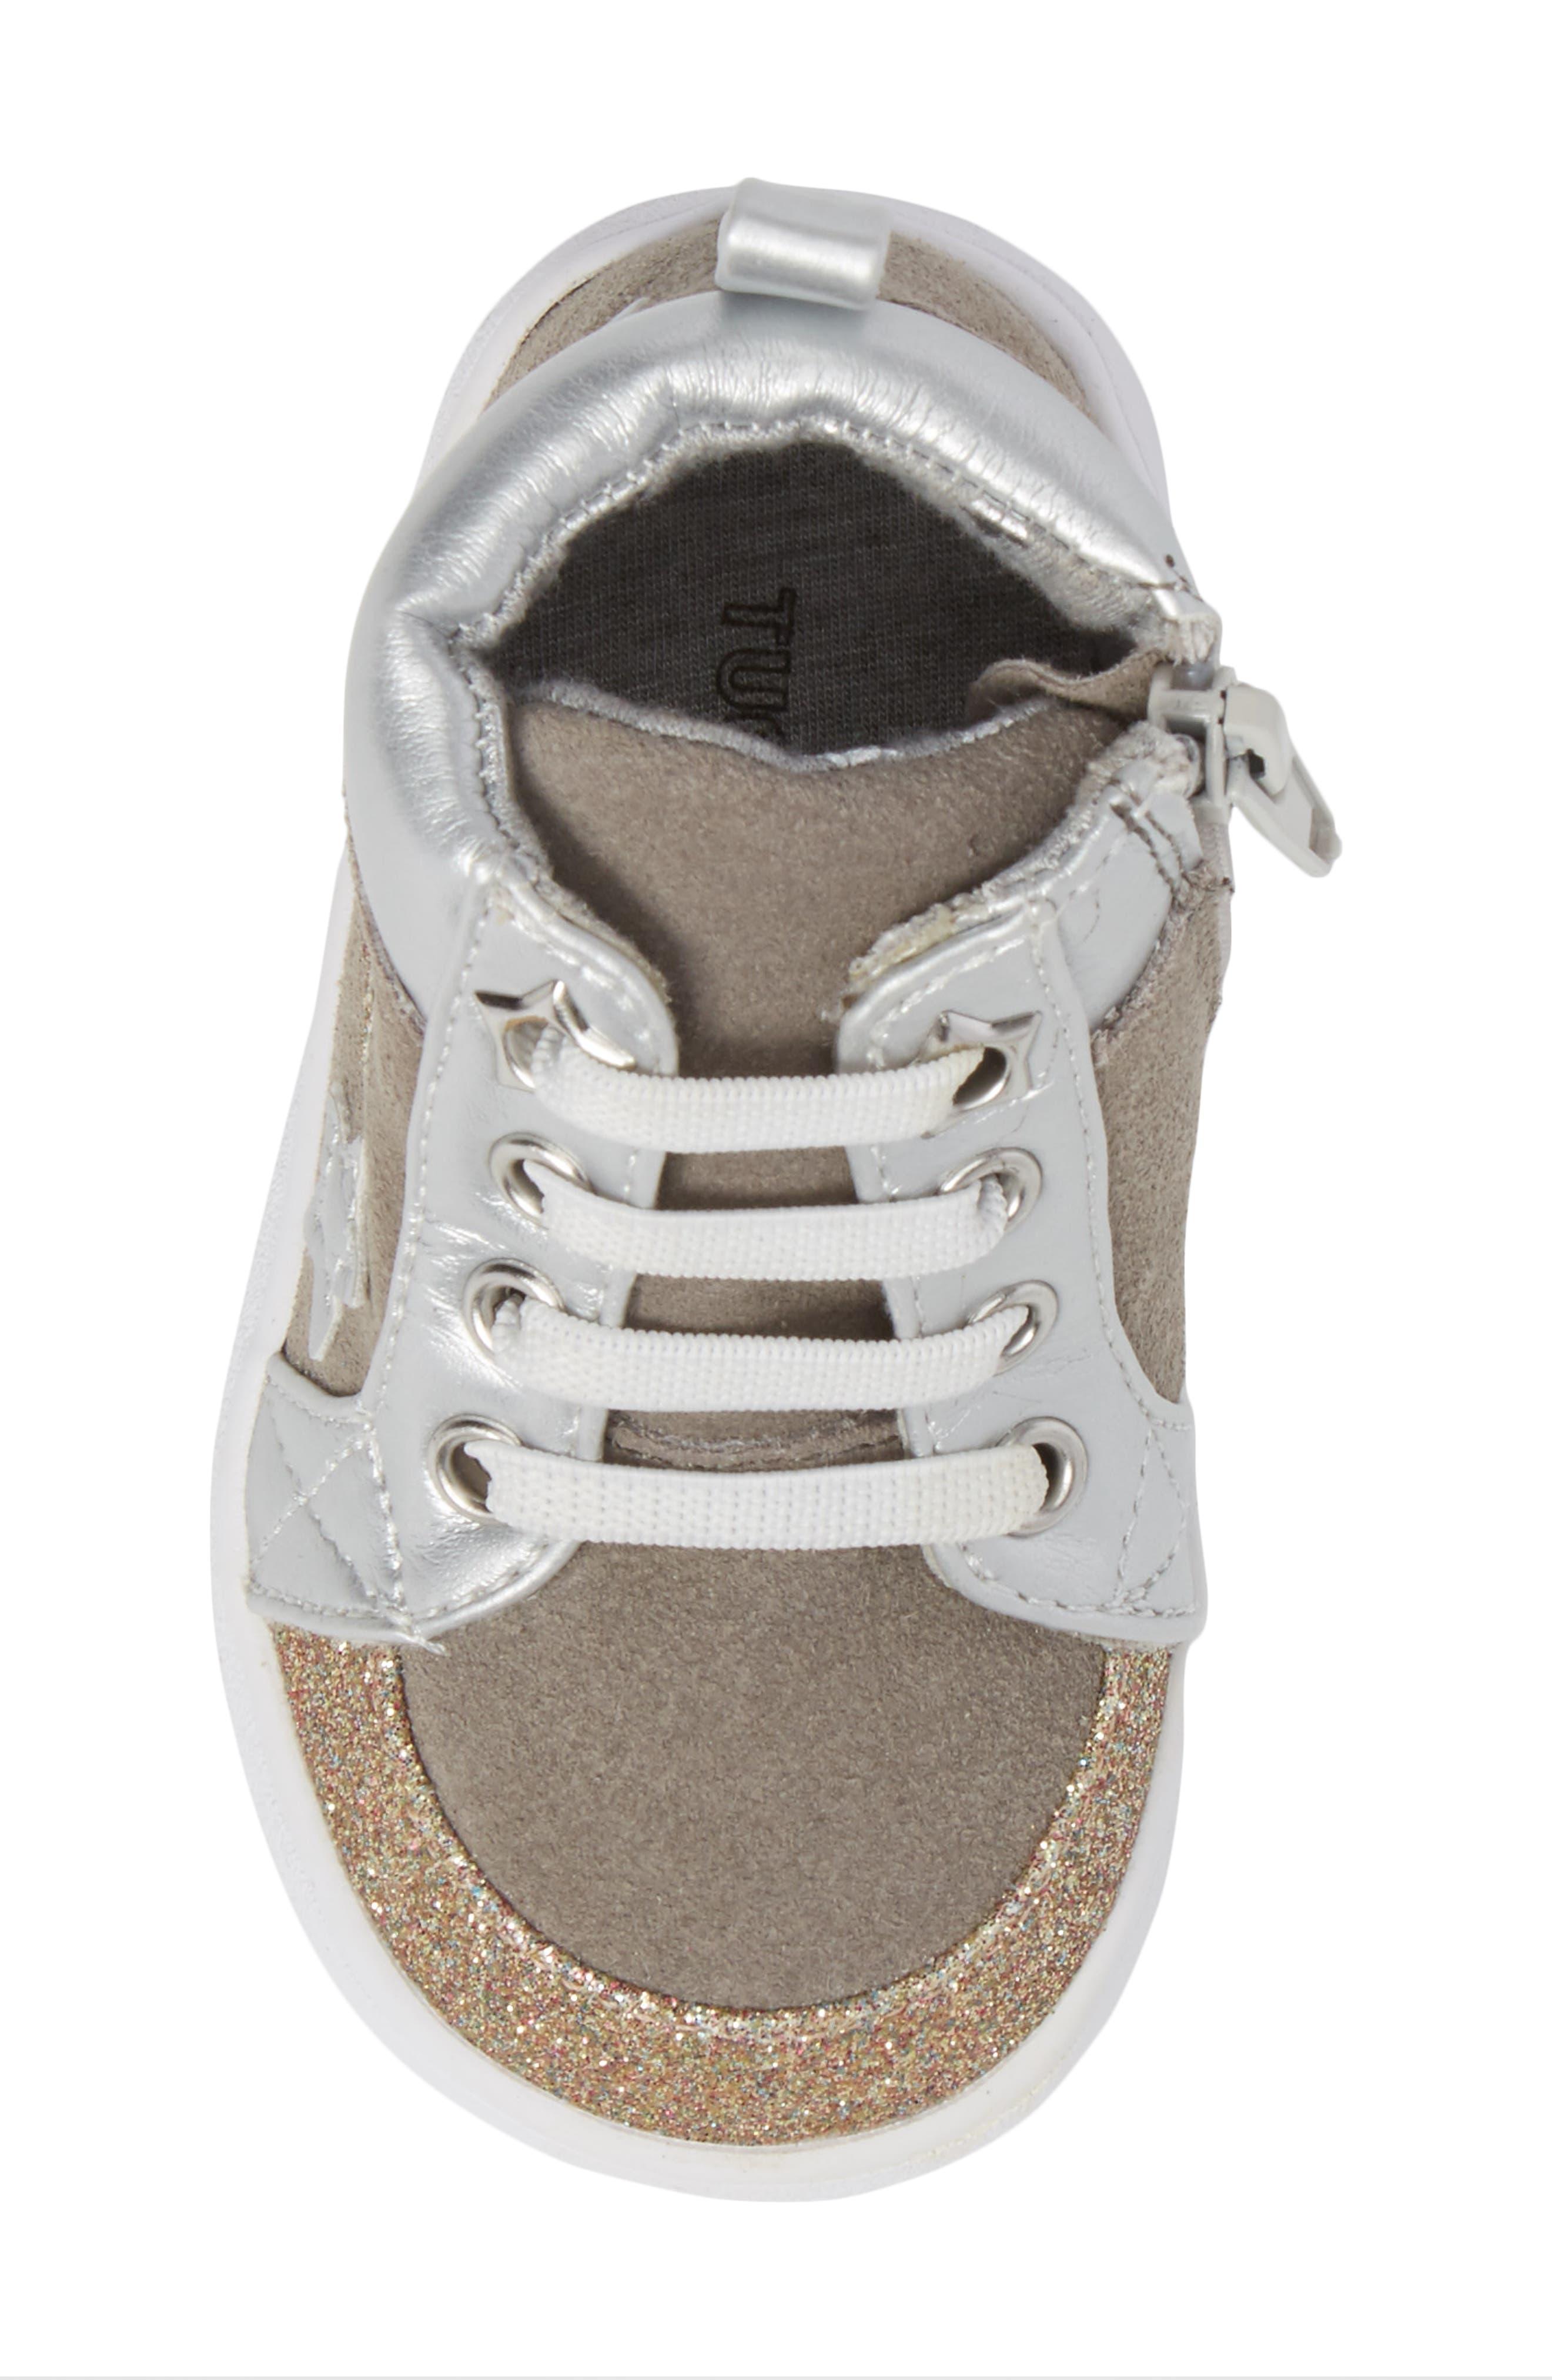 Diantha Star Appliqué High Top Sneaker,                             Alternate thumbnail 5, color,                             020